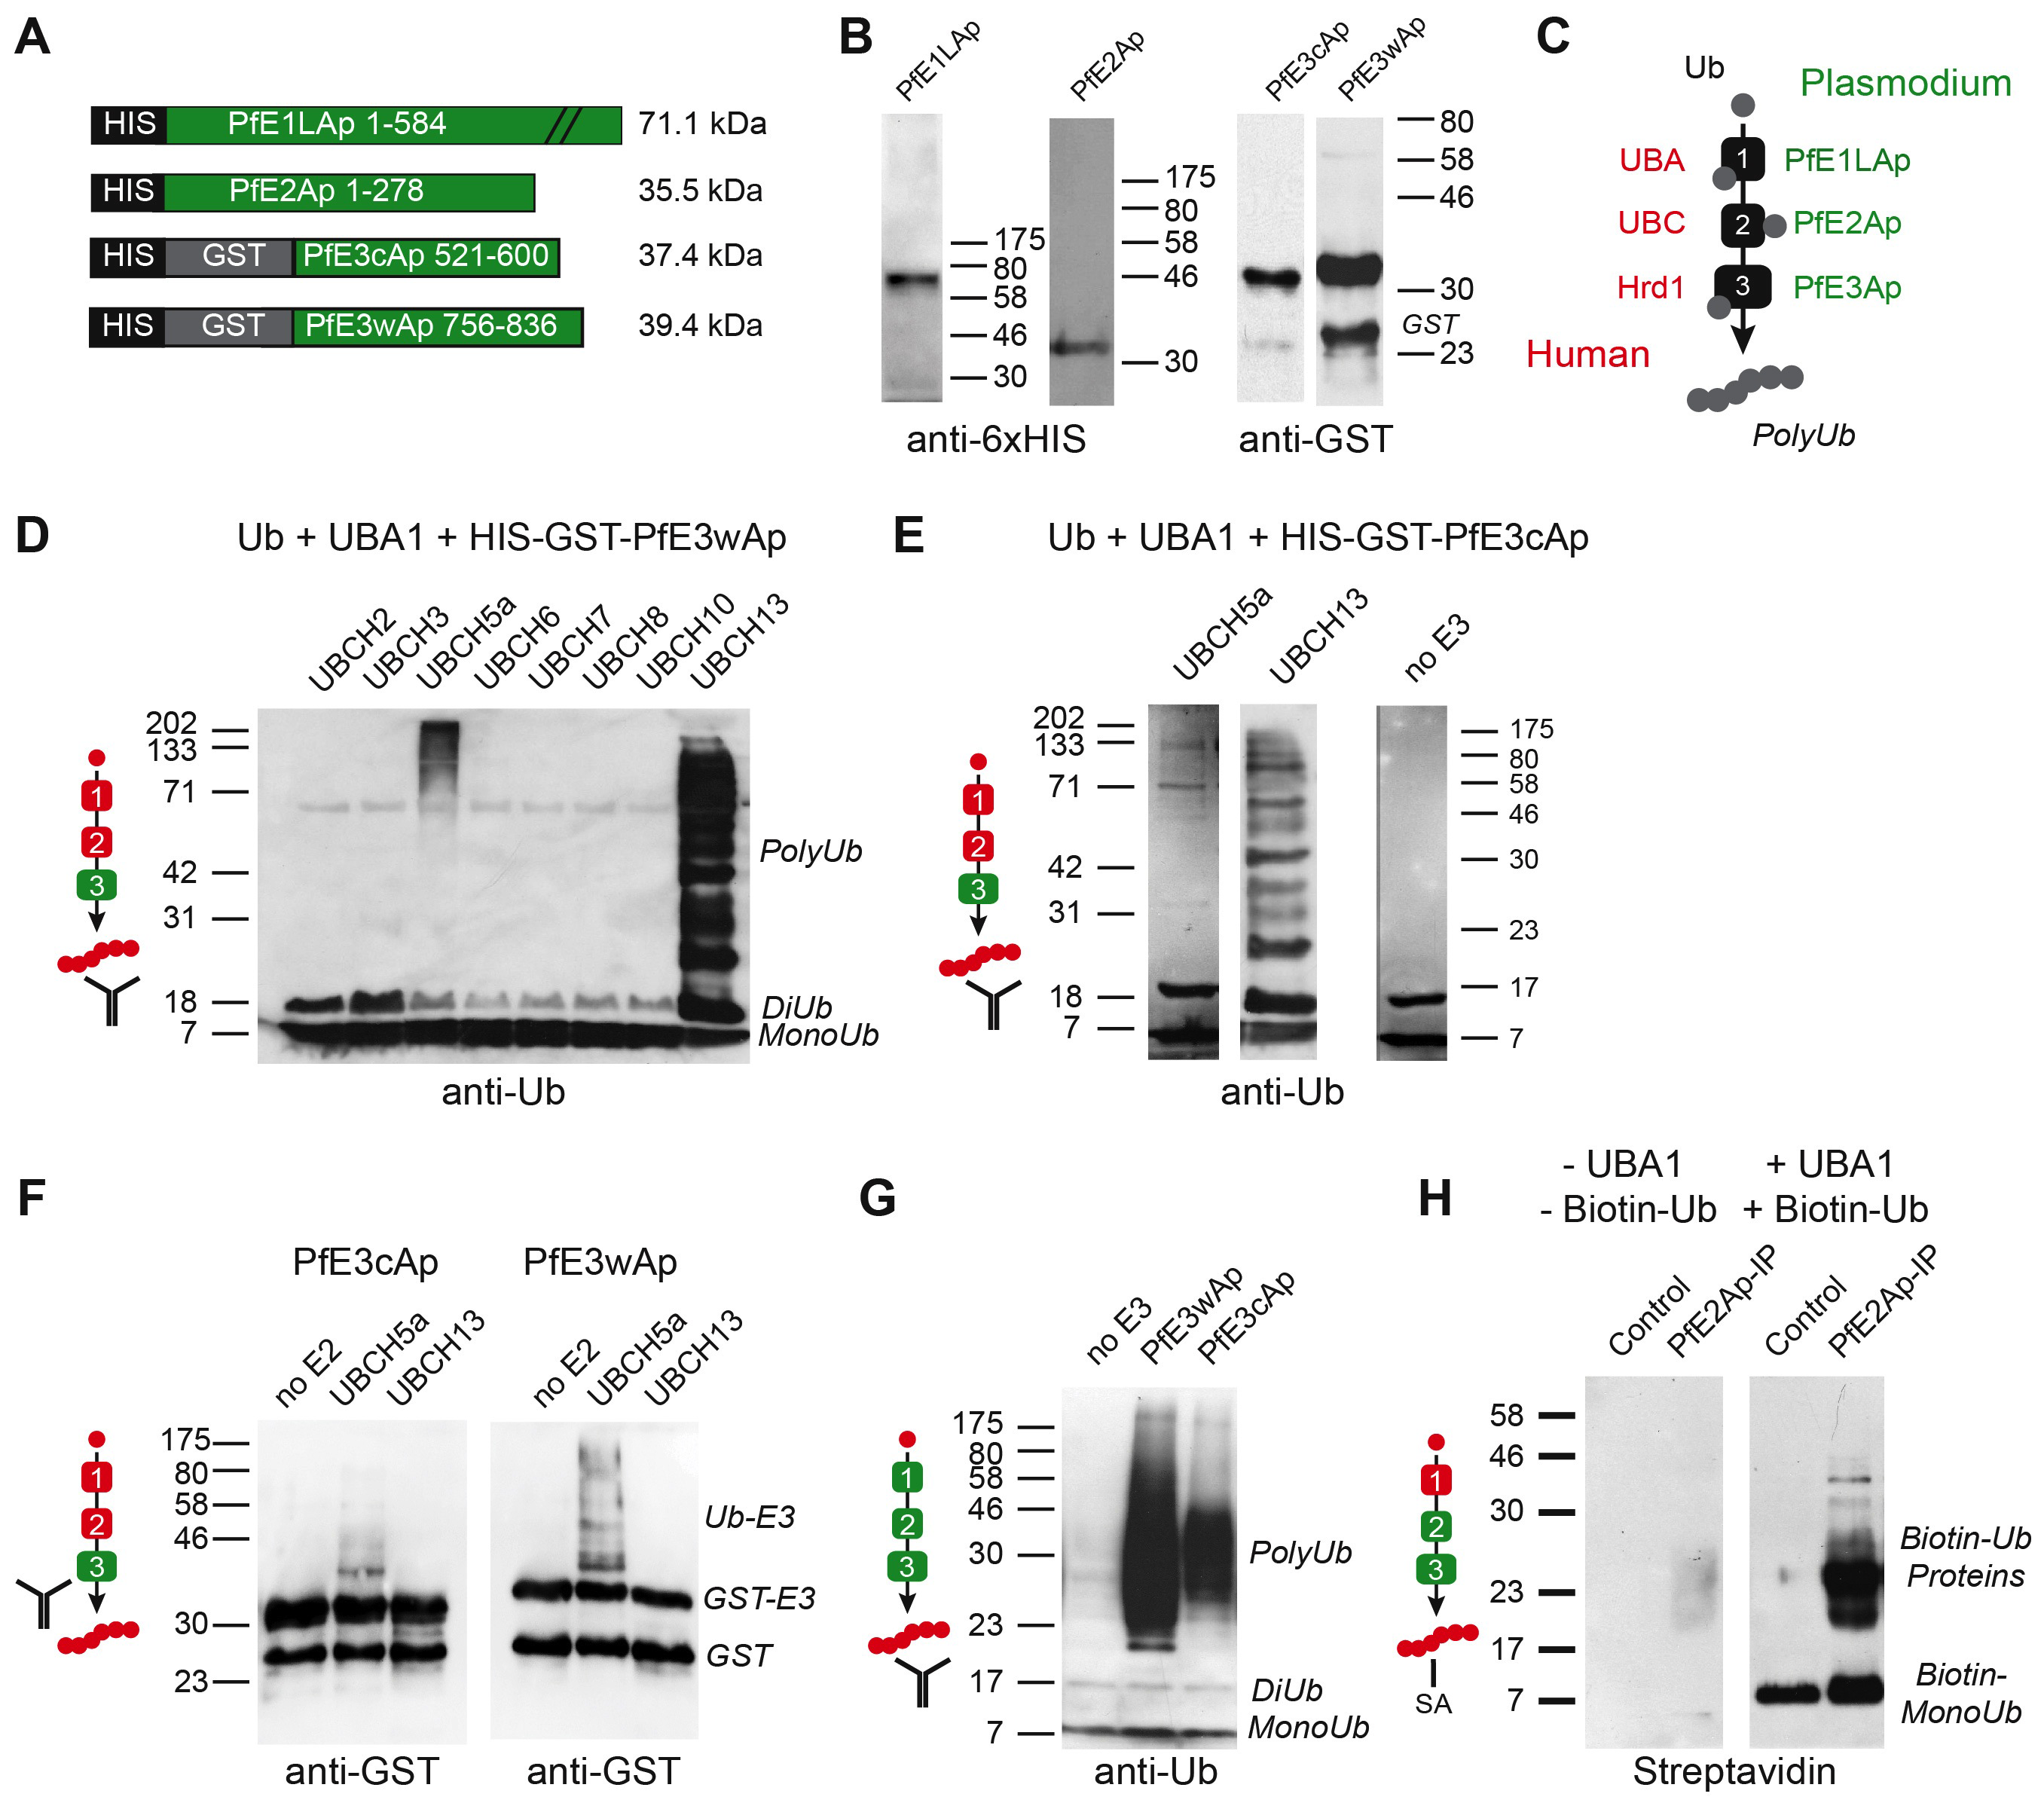 Recombinant <i>Plasmodium falciparum</i> apicoplast proteins show ubiquitin activation, conjugation and ligation activity.